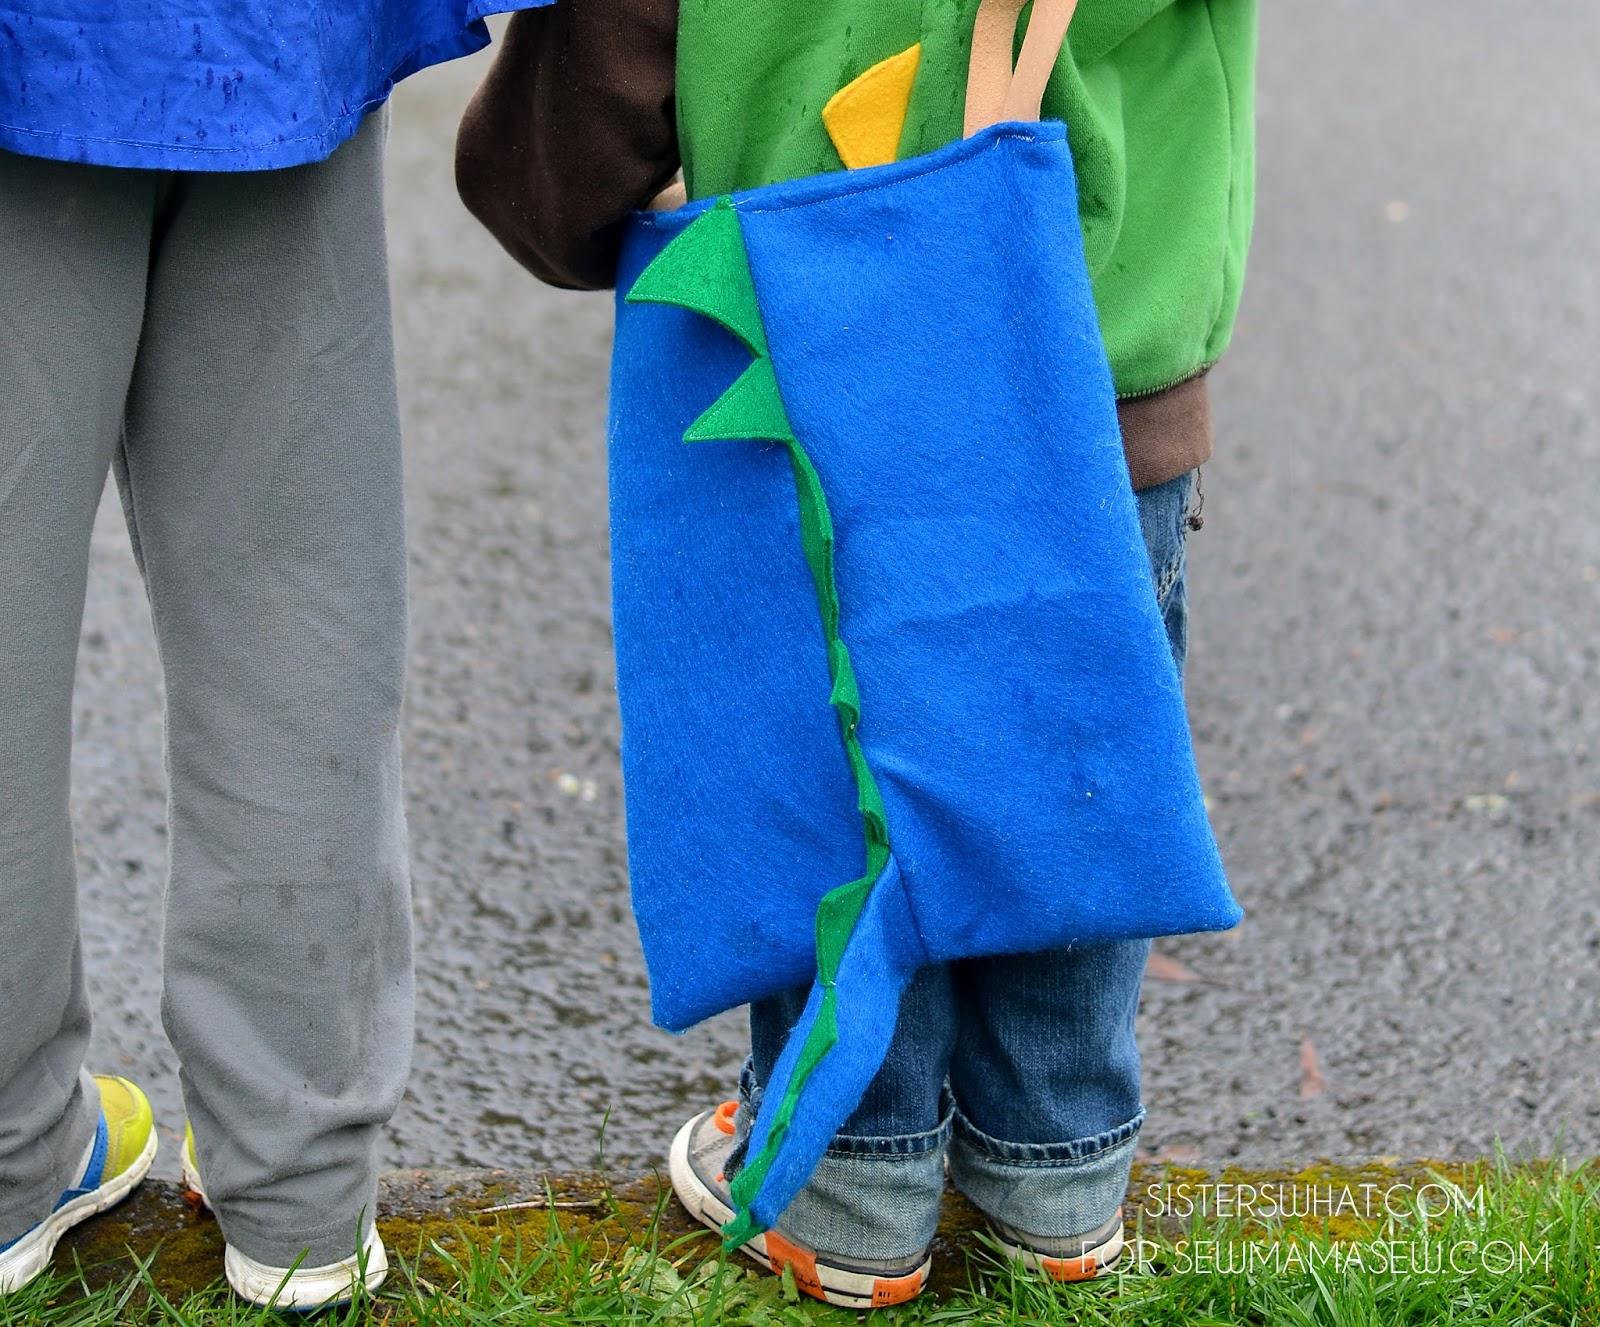 Dinosaur Bag Sewing Tutorial